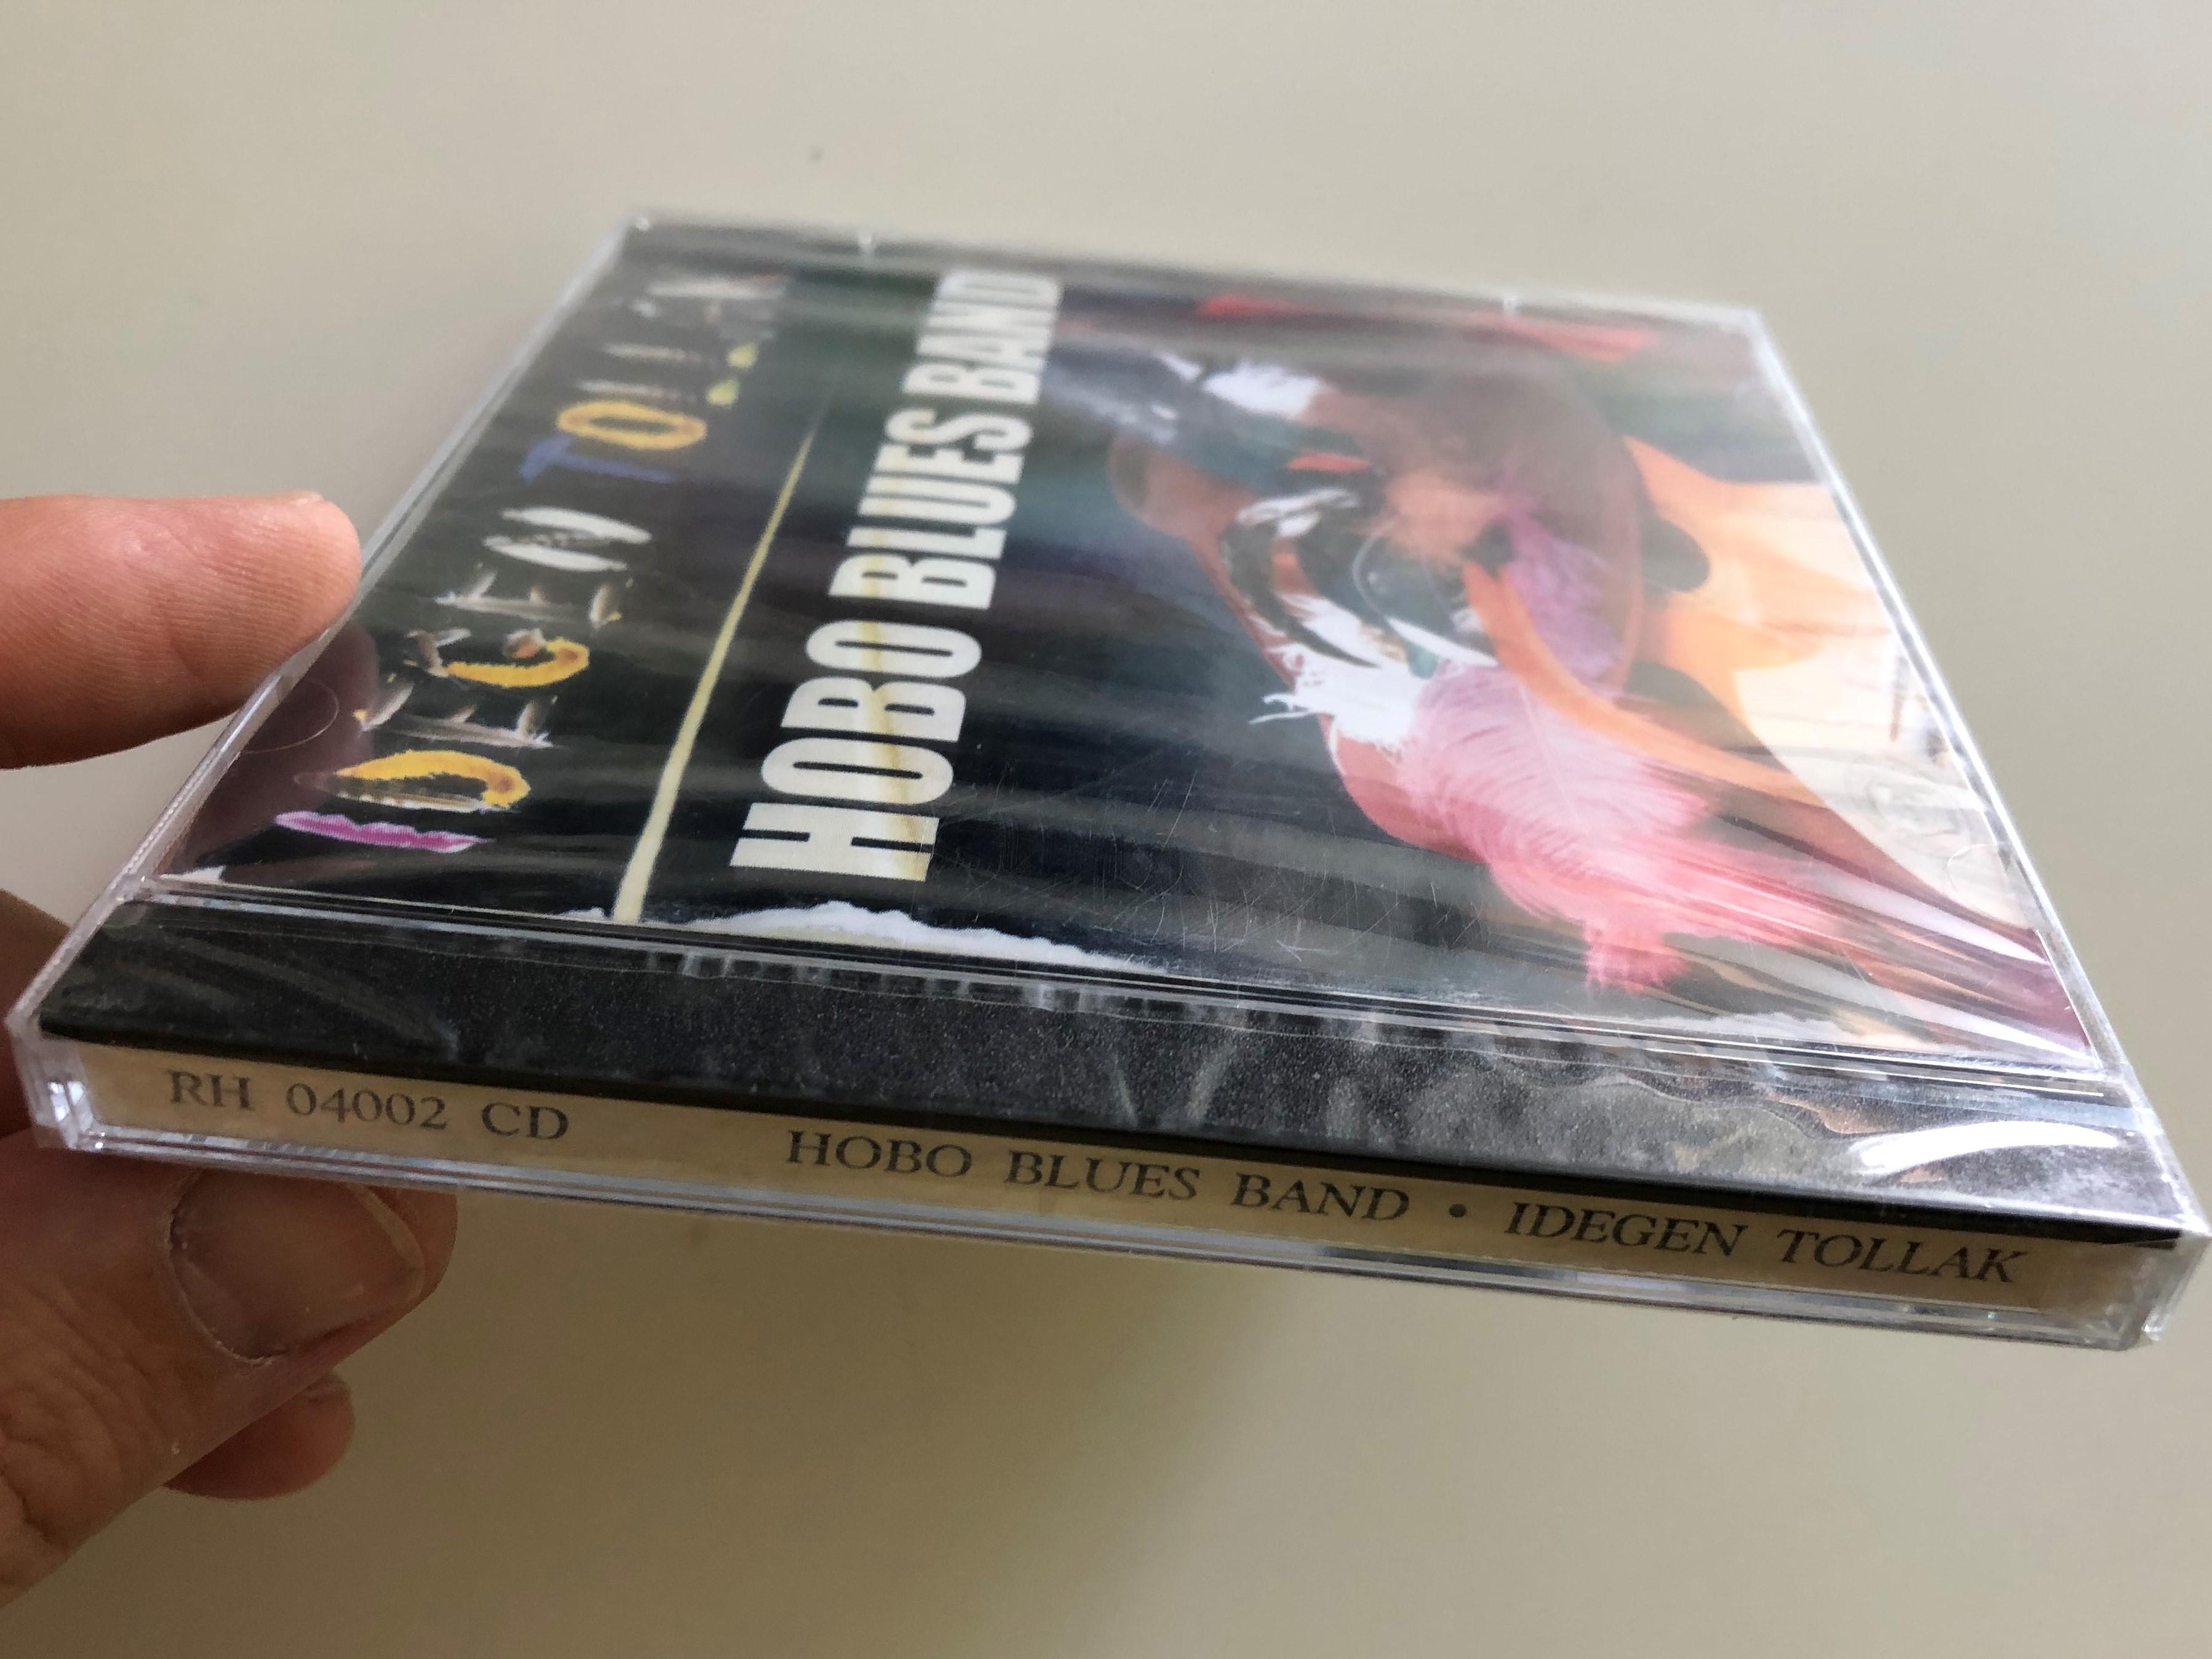 hobo-blues-band-idegen-tollak-2x-audio-cd-2004-rock-hard-records-musicdome-rh-04002-cd-3-.jpg